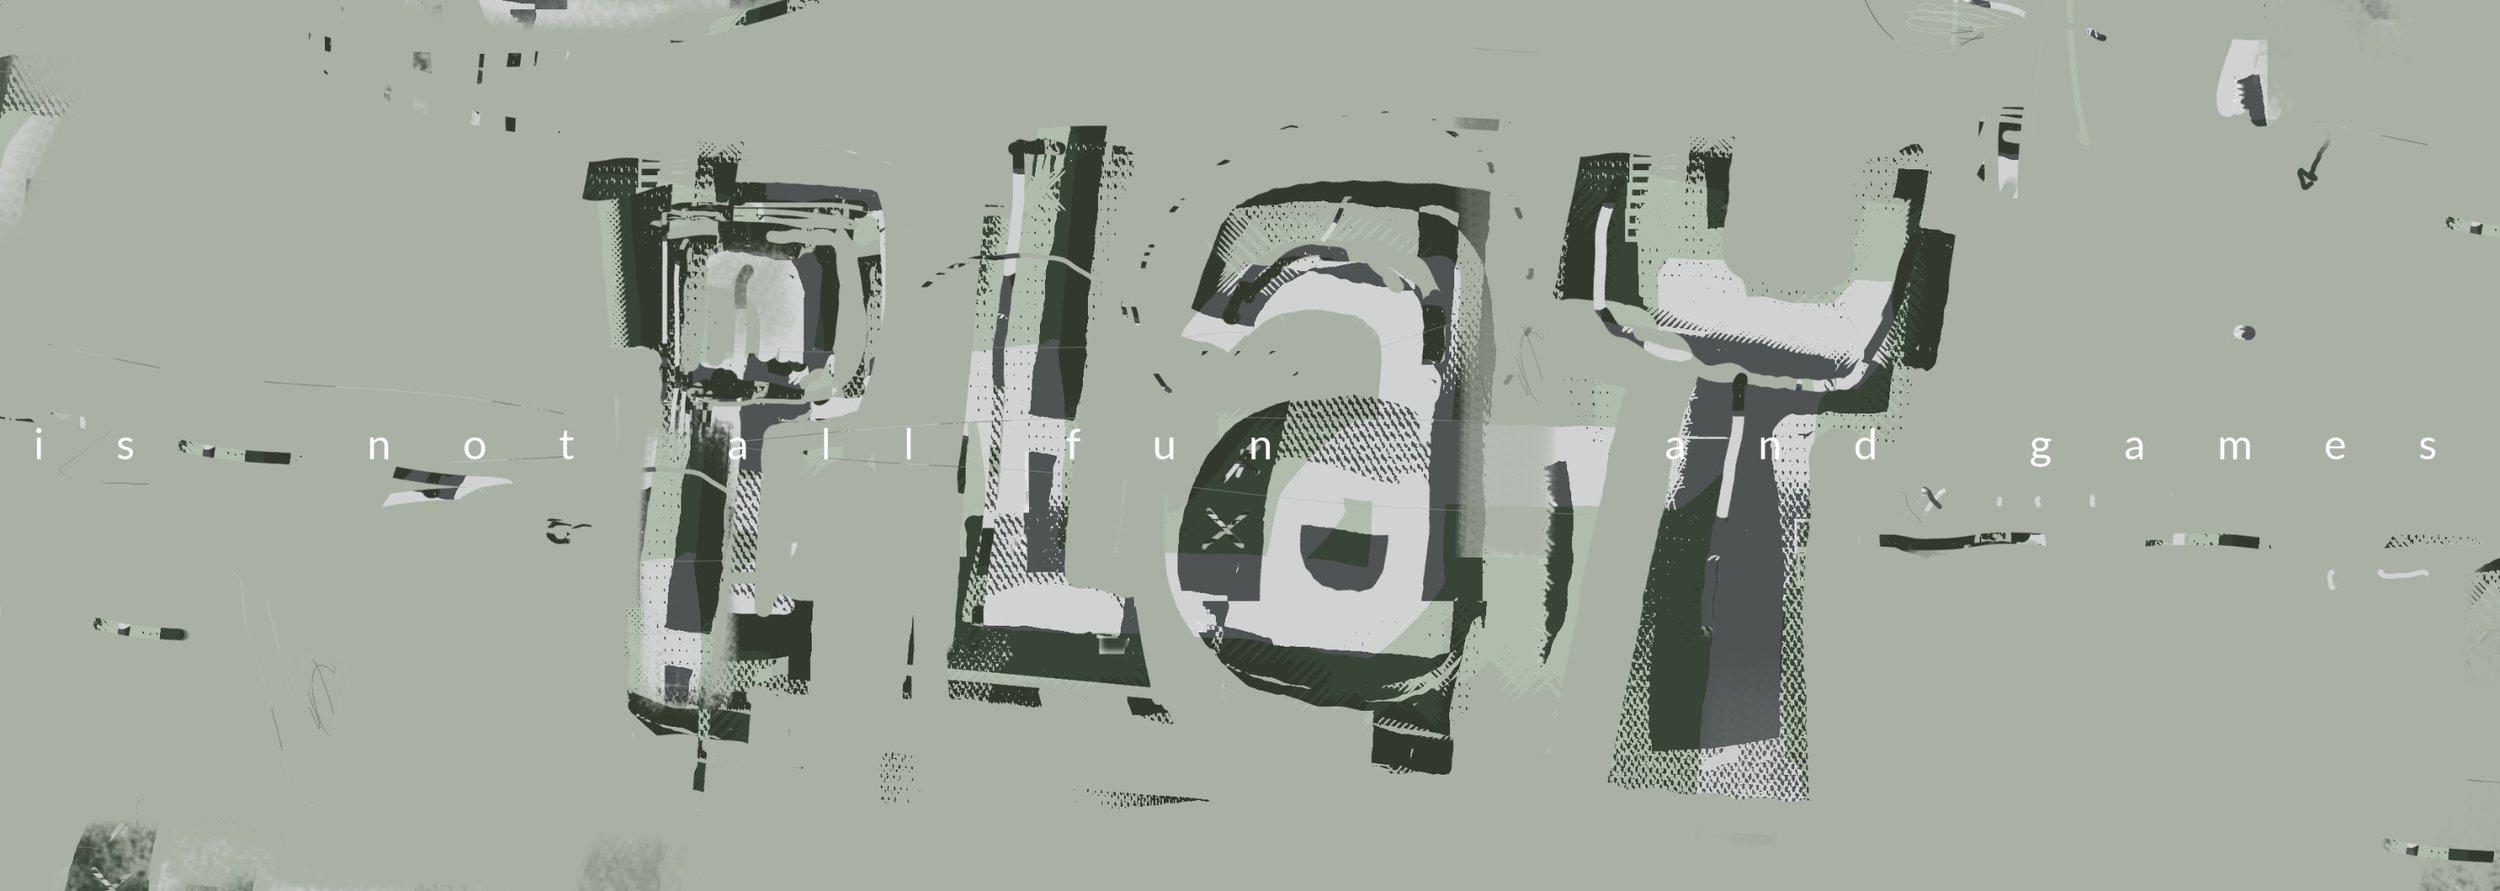 print_001.jpg